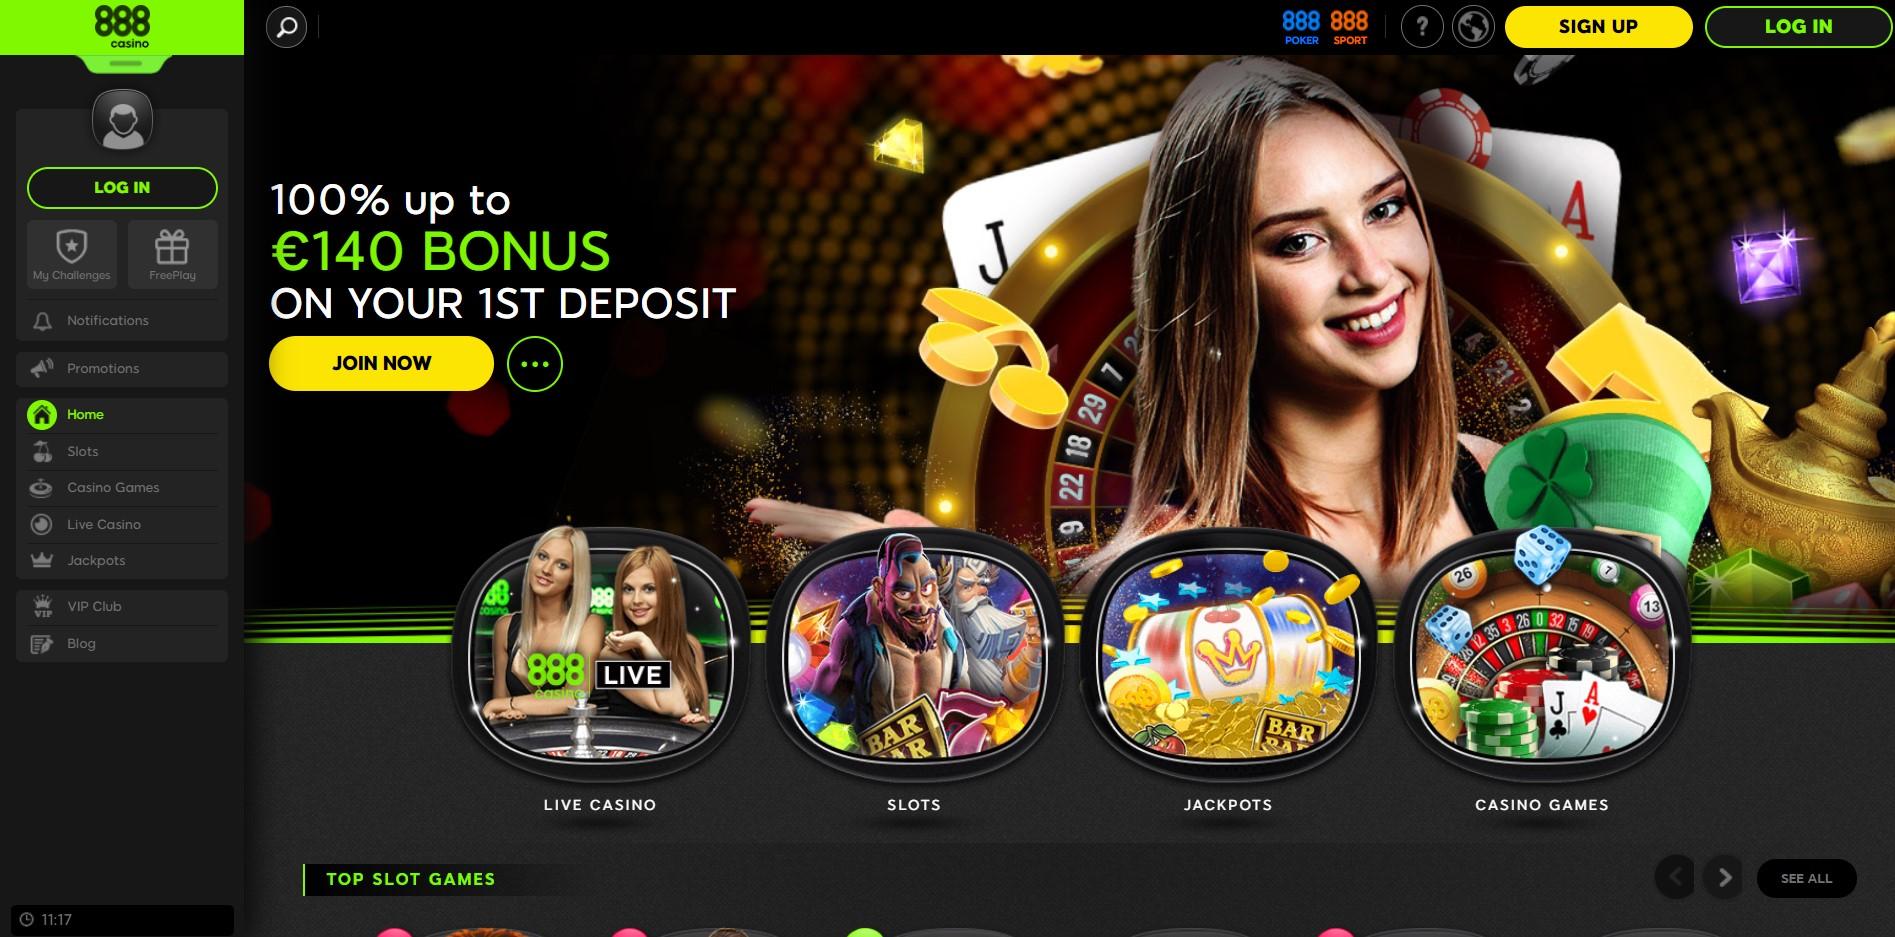 Casino 888 bonuses